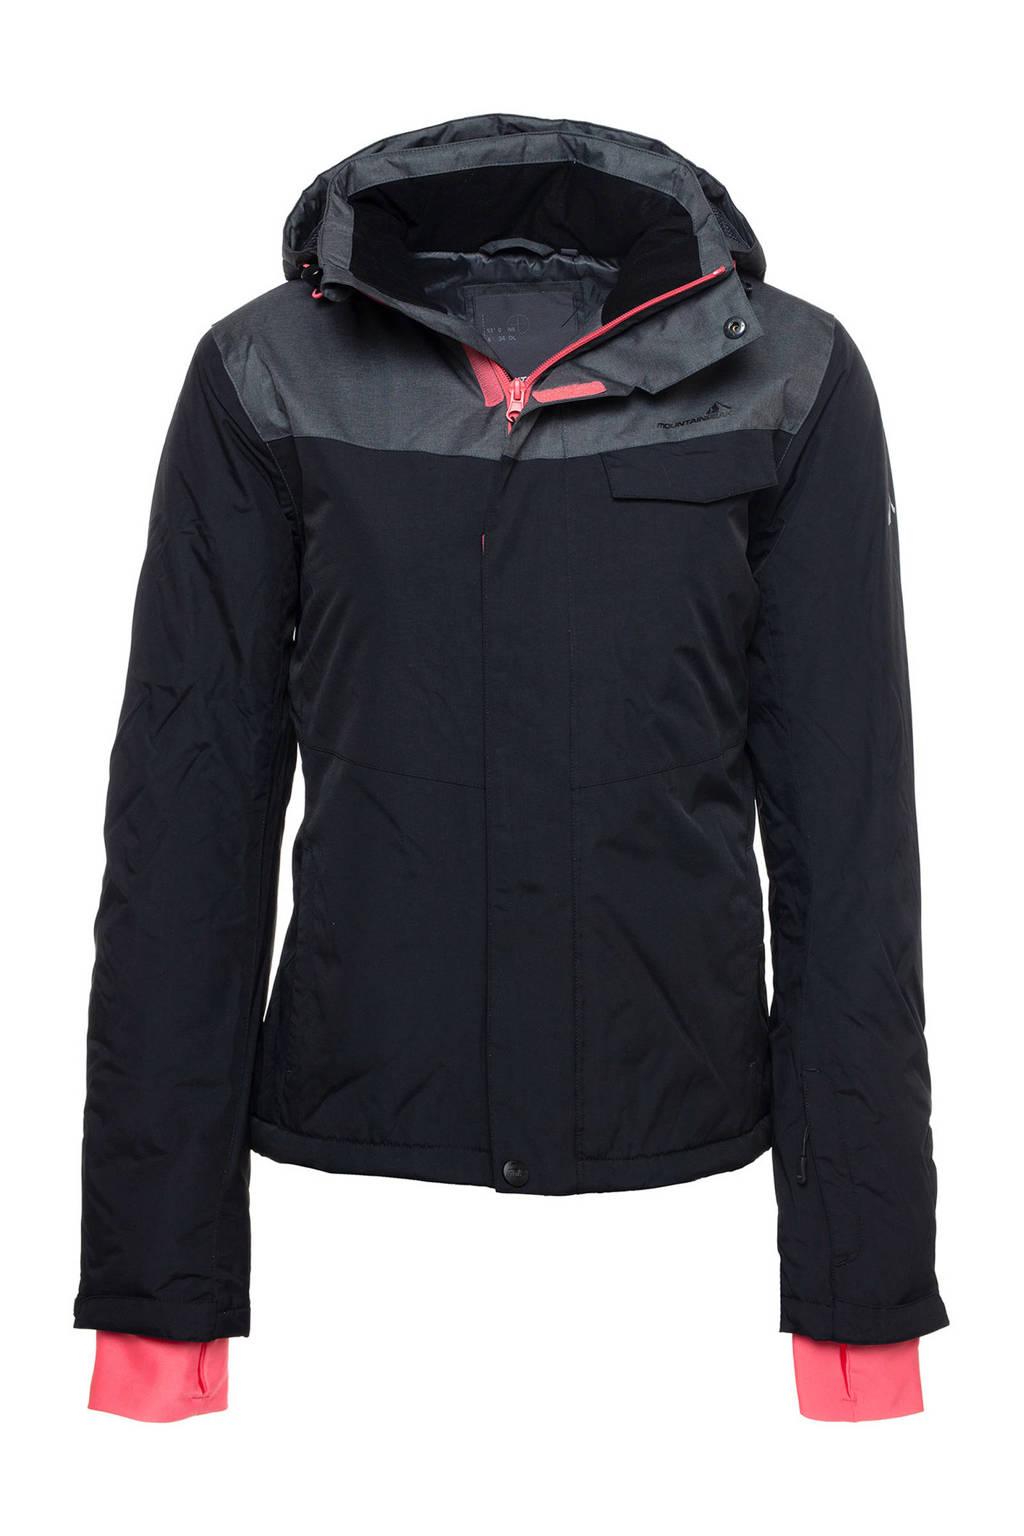 Mountain Peak ski-jack zwart/grijs, Zwart/grijs/roze